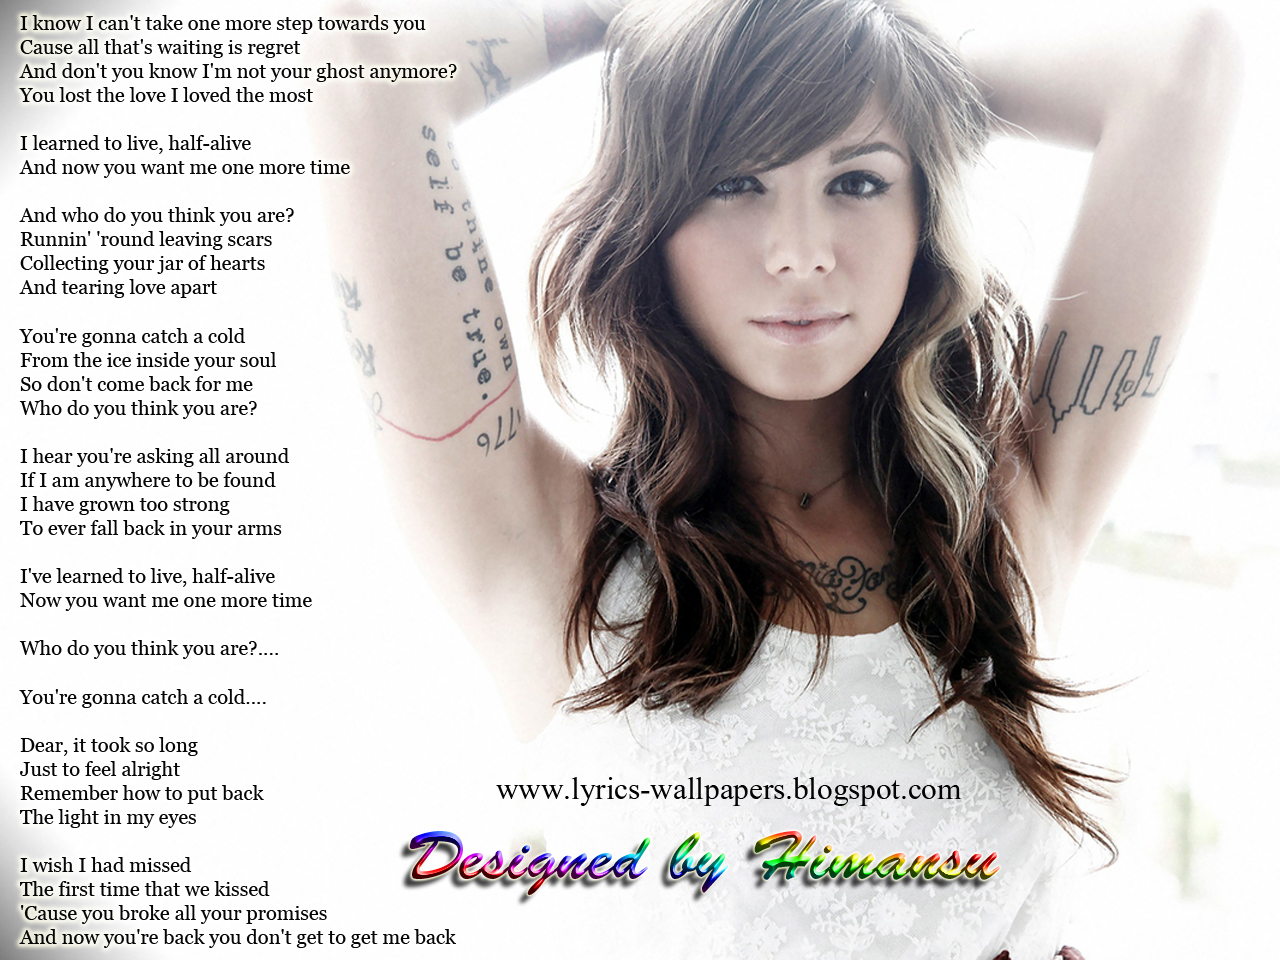 Lyrics Wallpapers: Christina Perri - Jar of Hearts